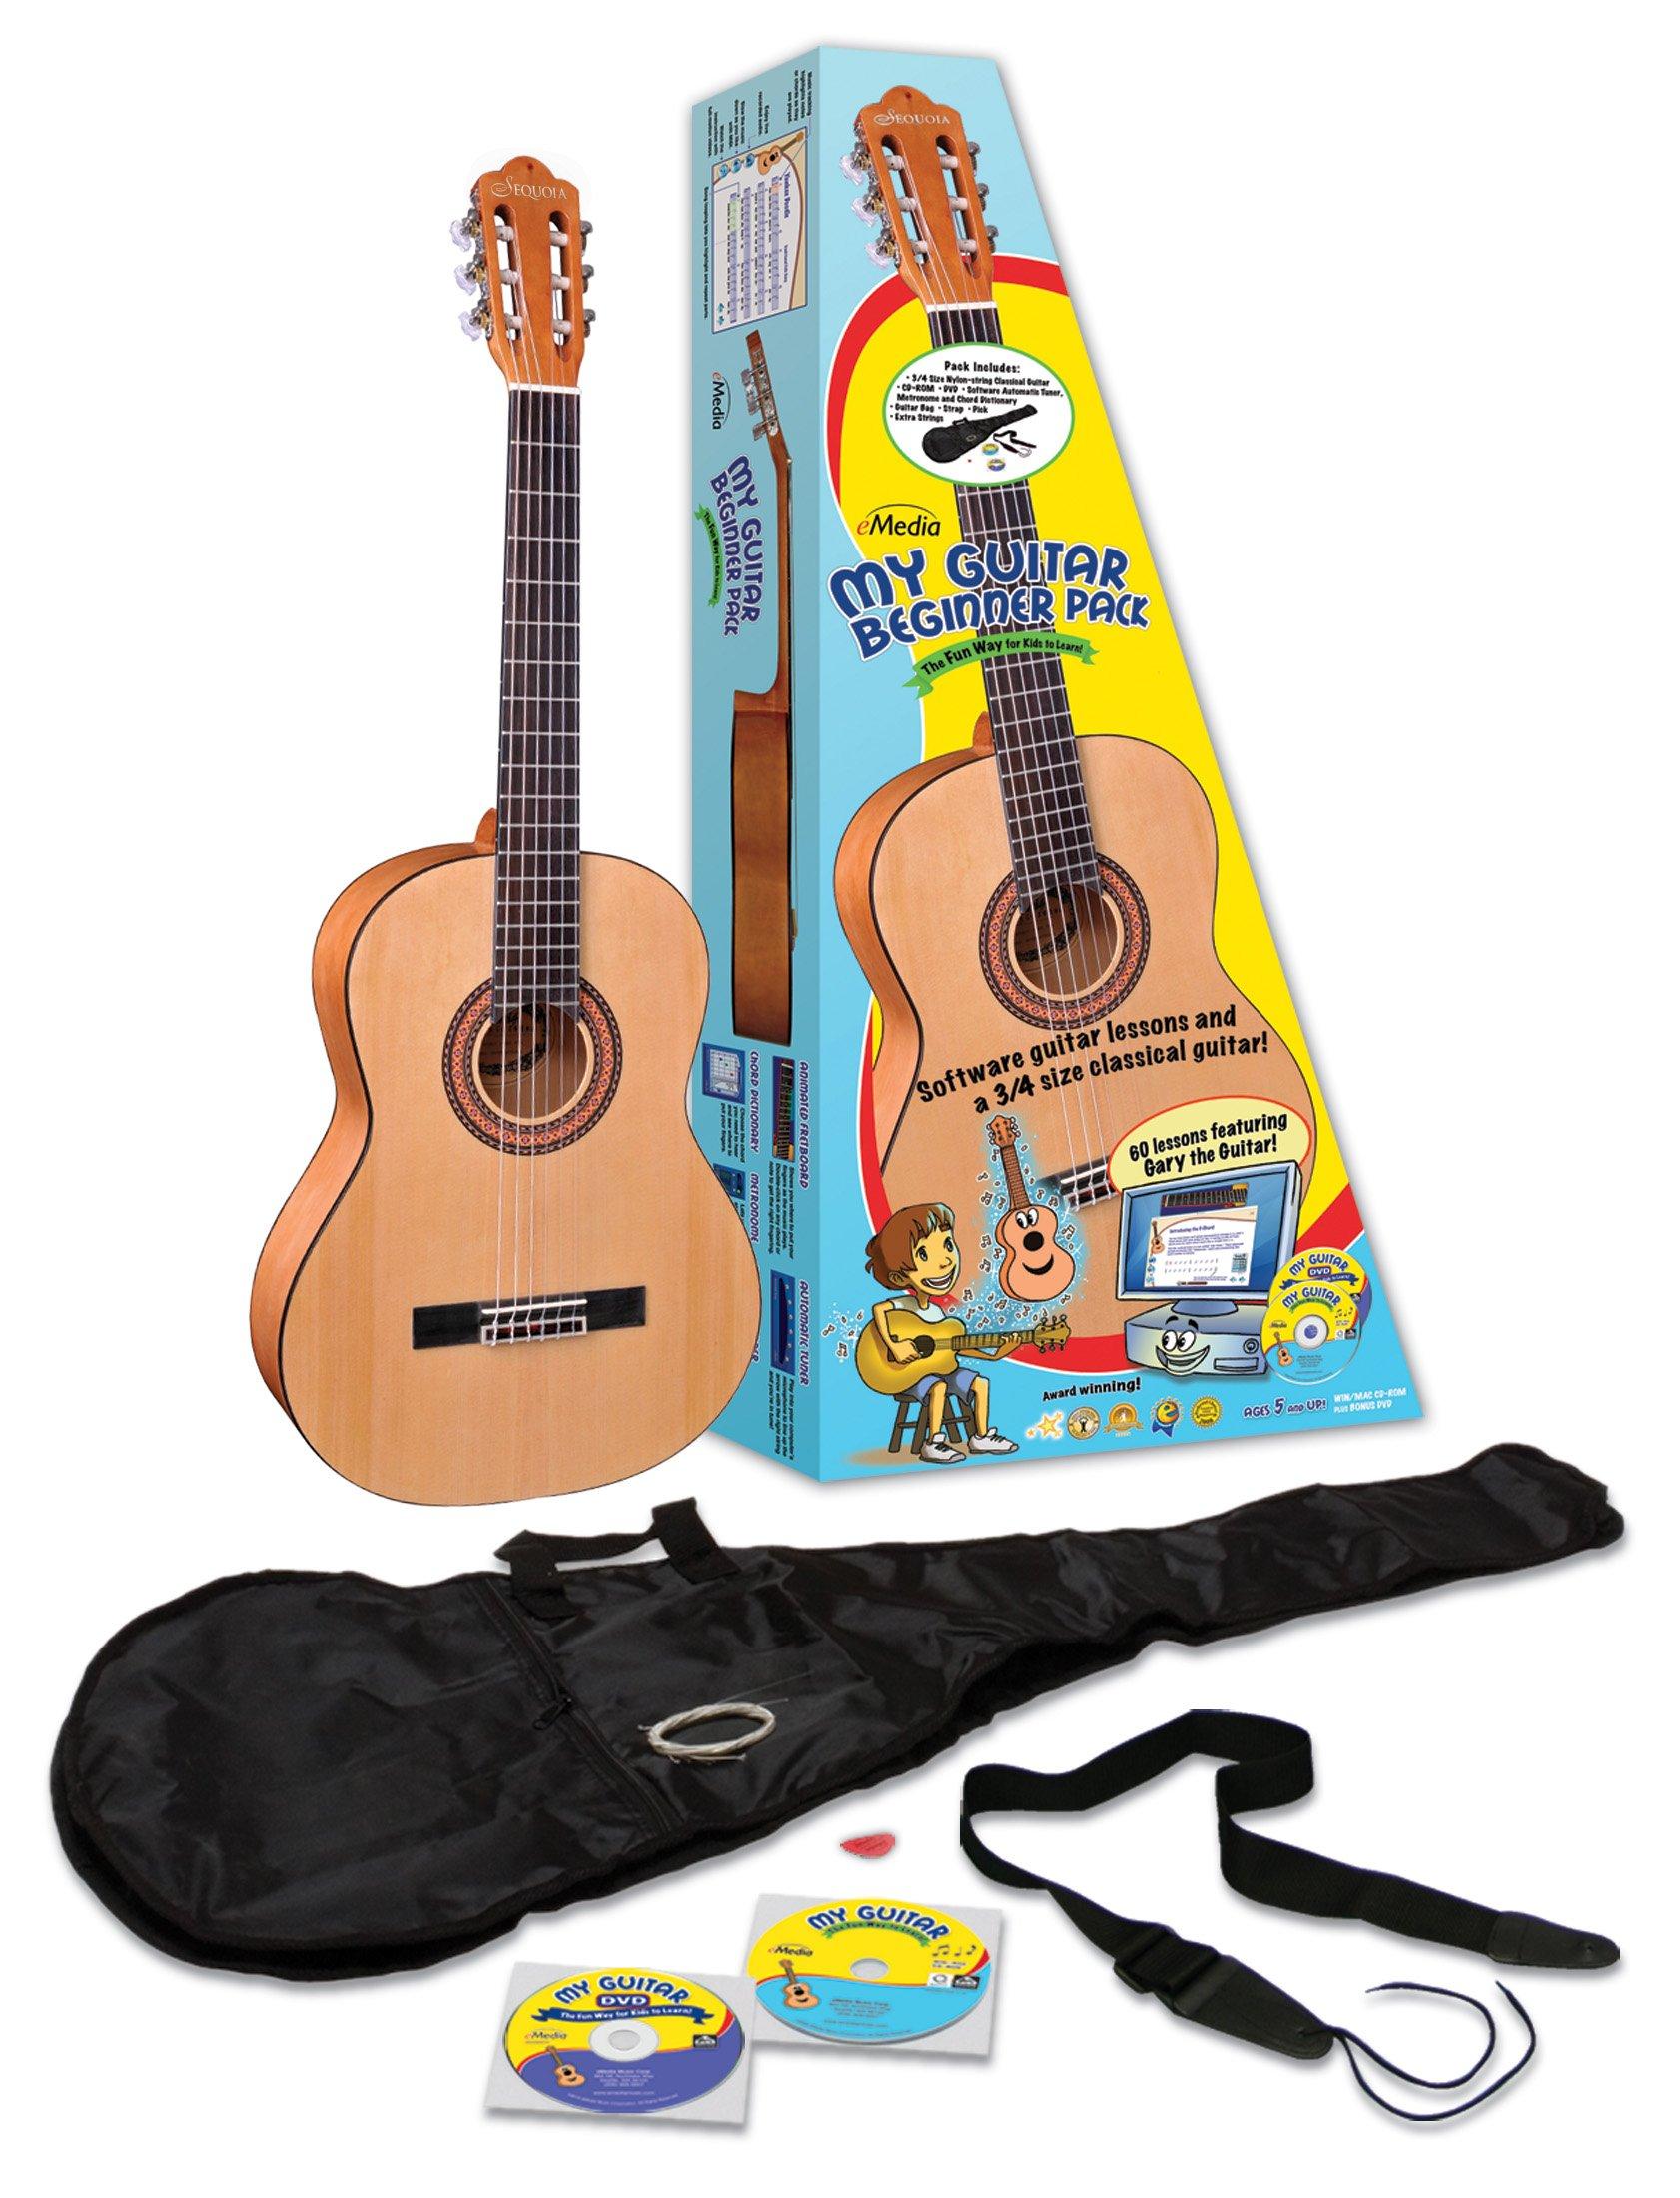 eMedia My Guitar Beginner Pack for Kids - 3/4-size, nylon-string, acoustic guitar (34'') plus guitar lessons made for kids